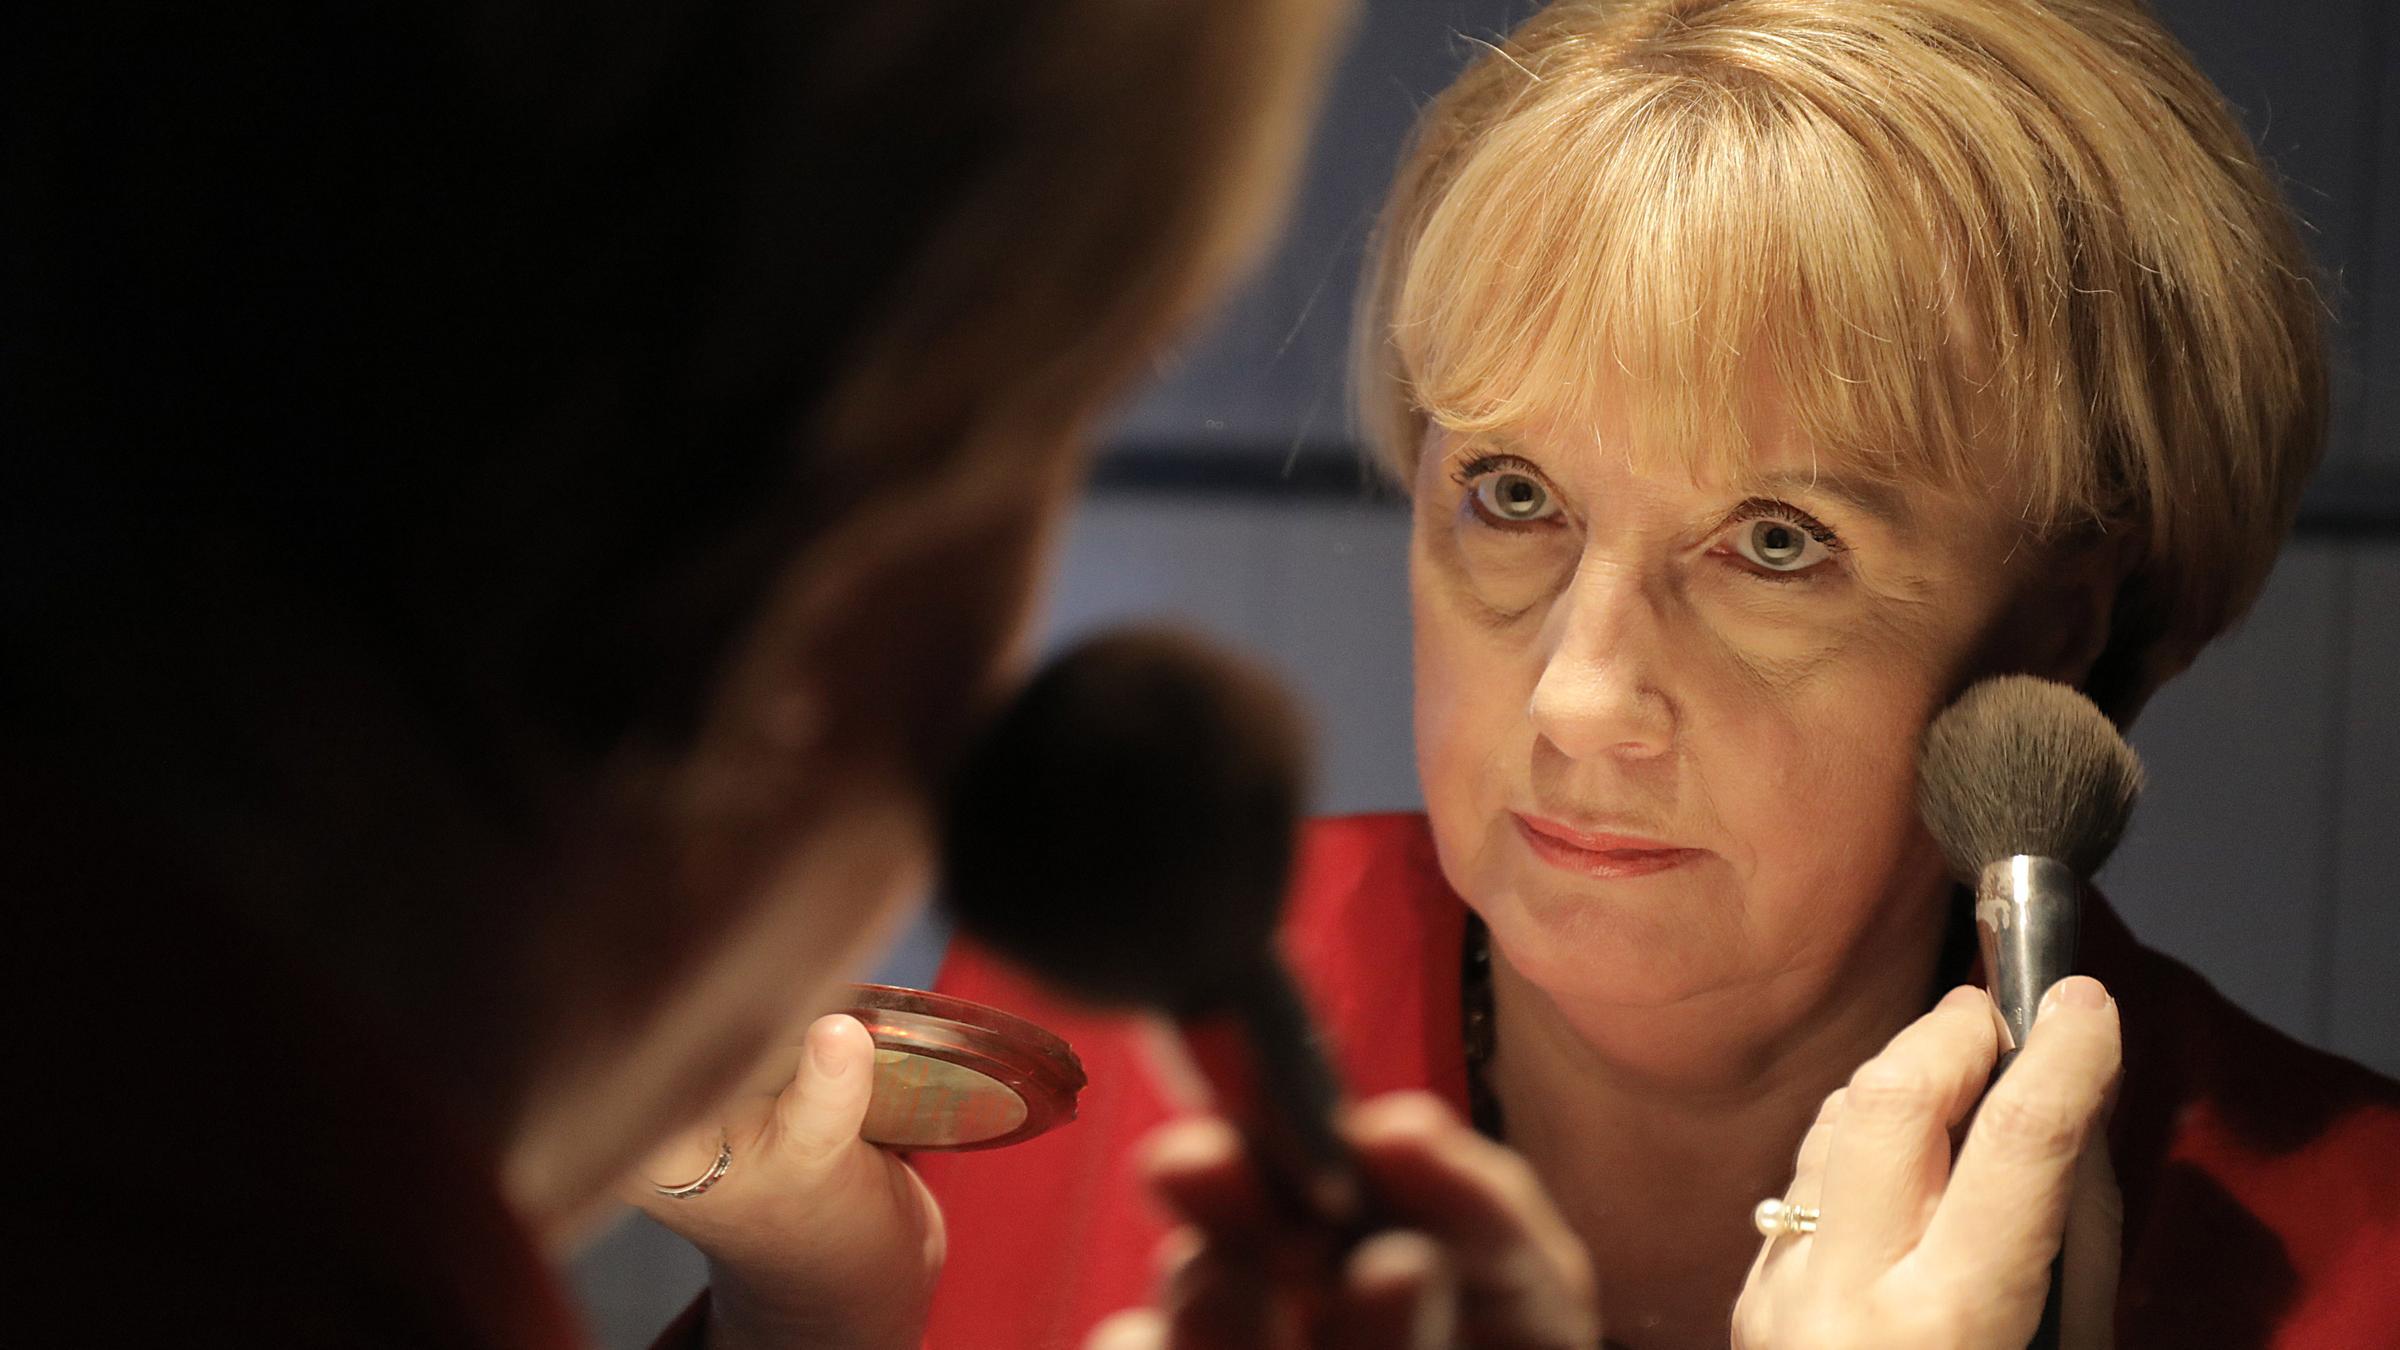 Merkel Double Erstmal Ins Nagelstudio Zdfmediathek